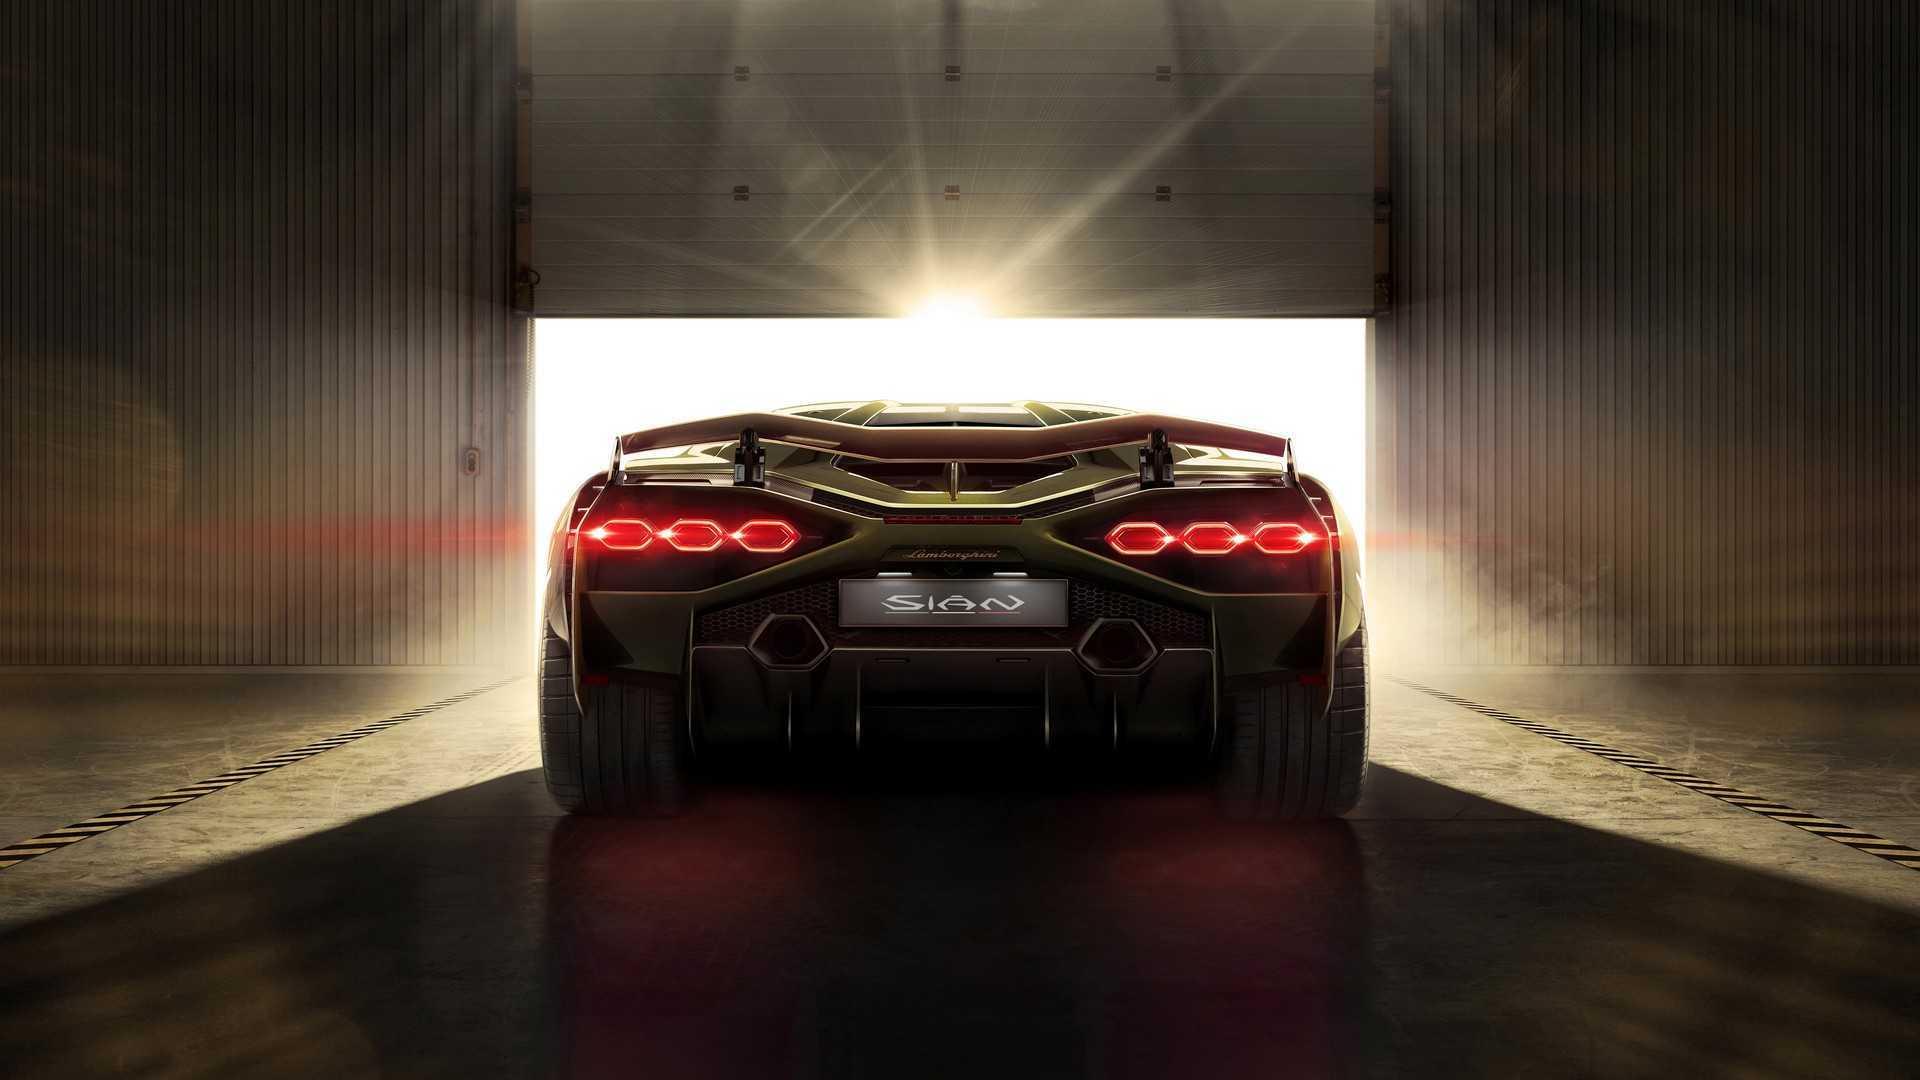 La Lamborghini Sián n'annonce pas le style de la future Aventador